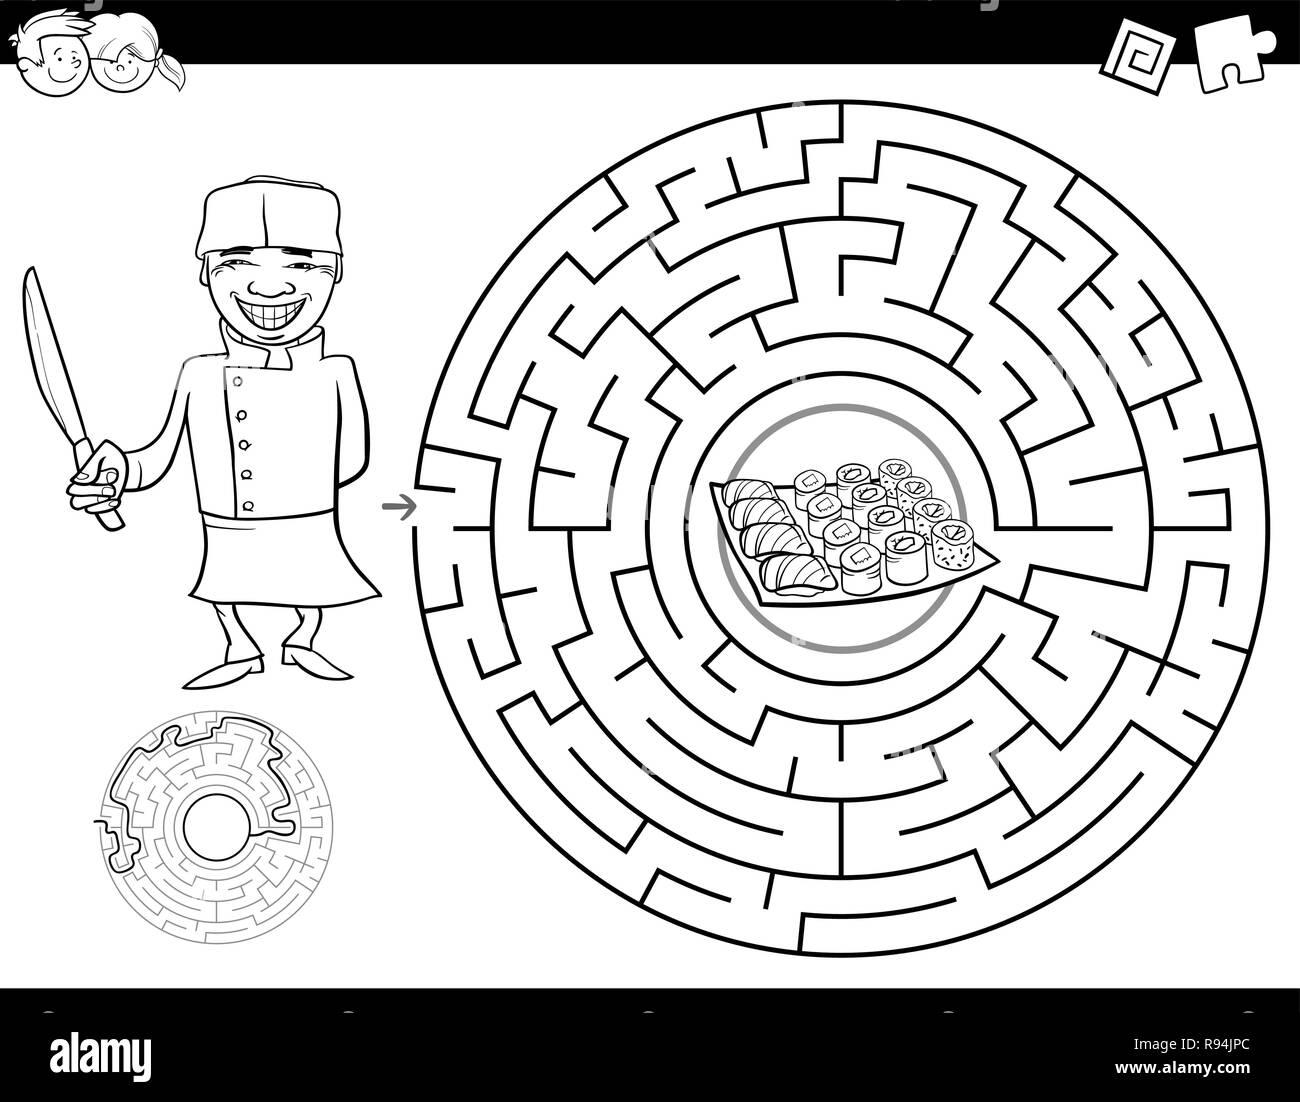 Black And White Cartoon Illustration Of Education Maze Or